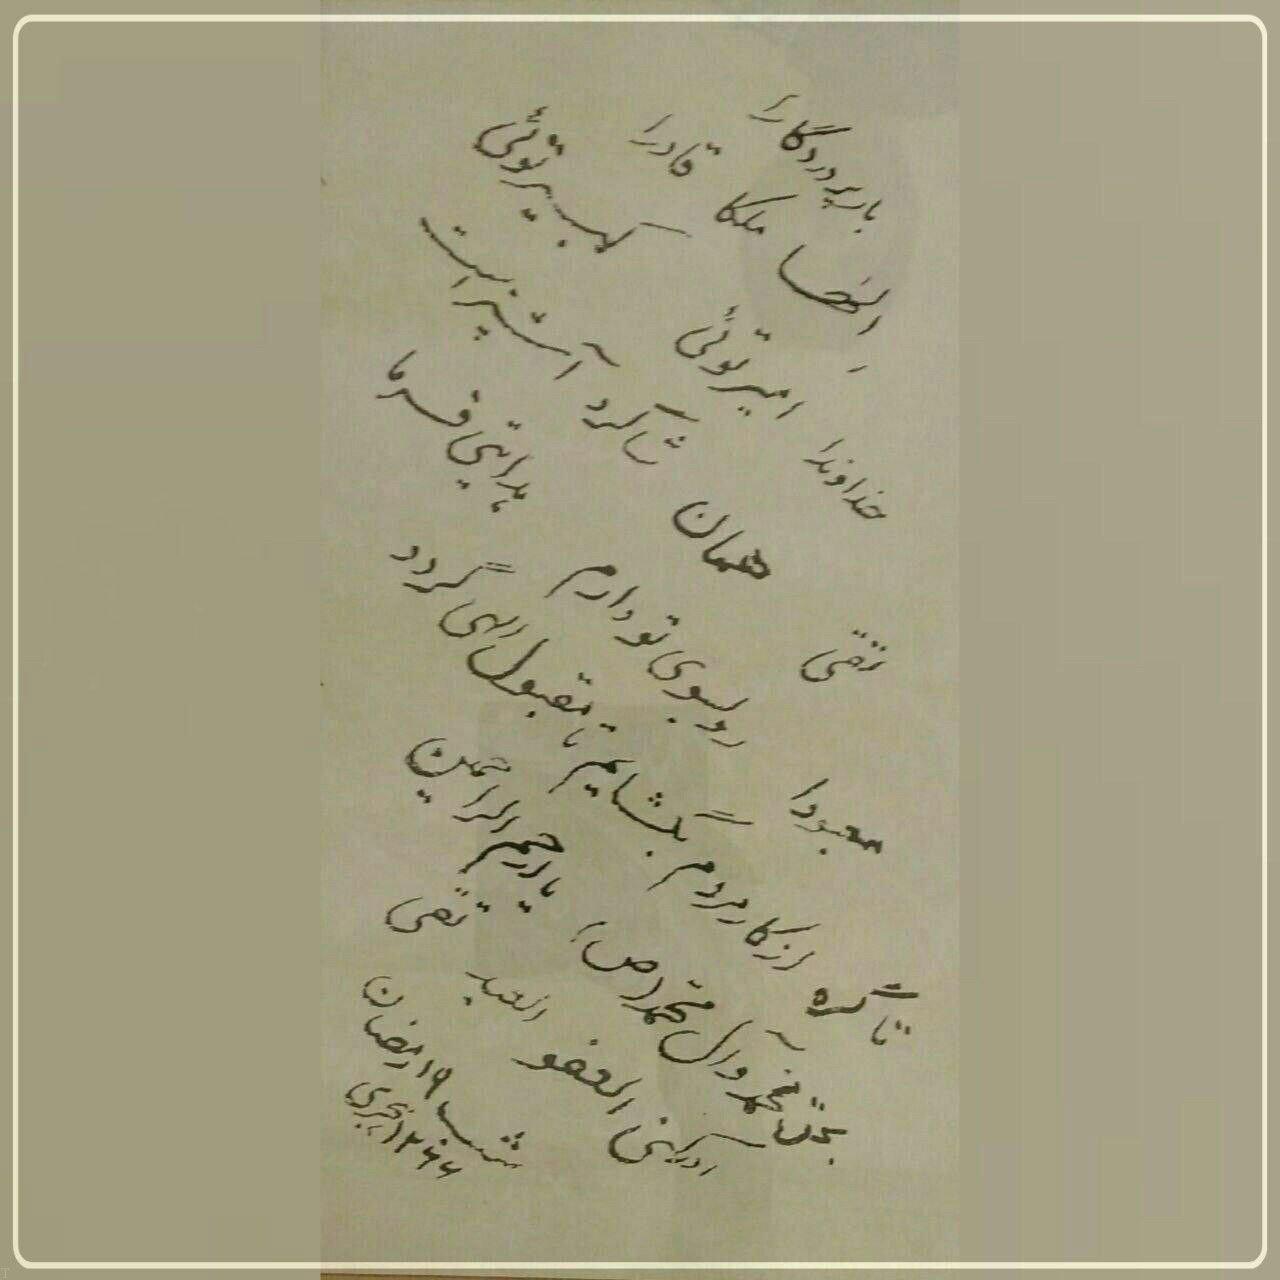 خط امير كبير در شب قدر (عکس)